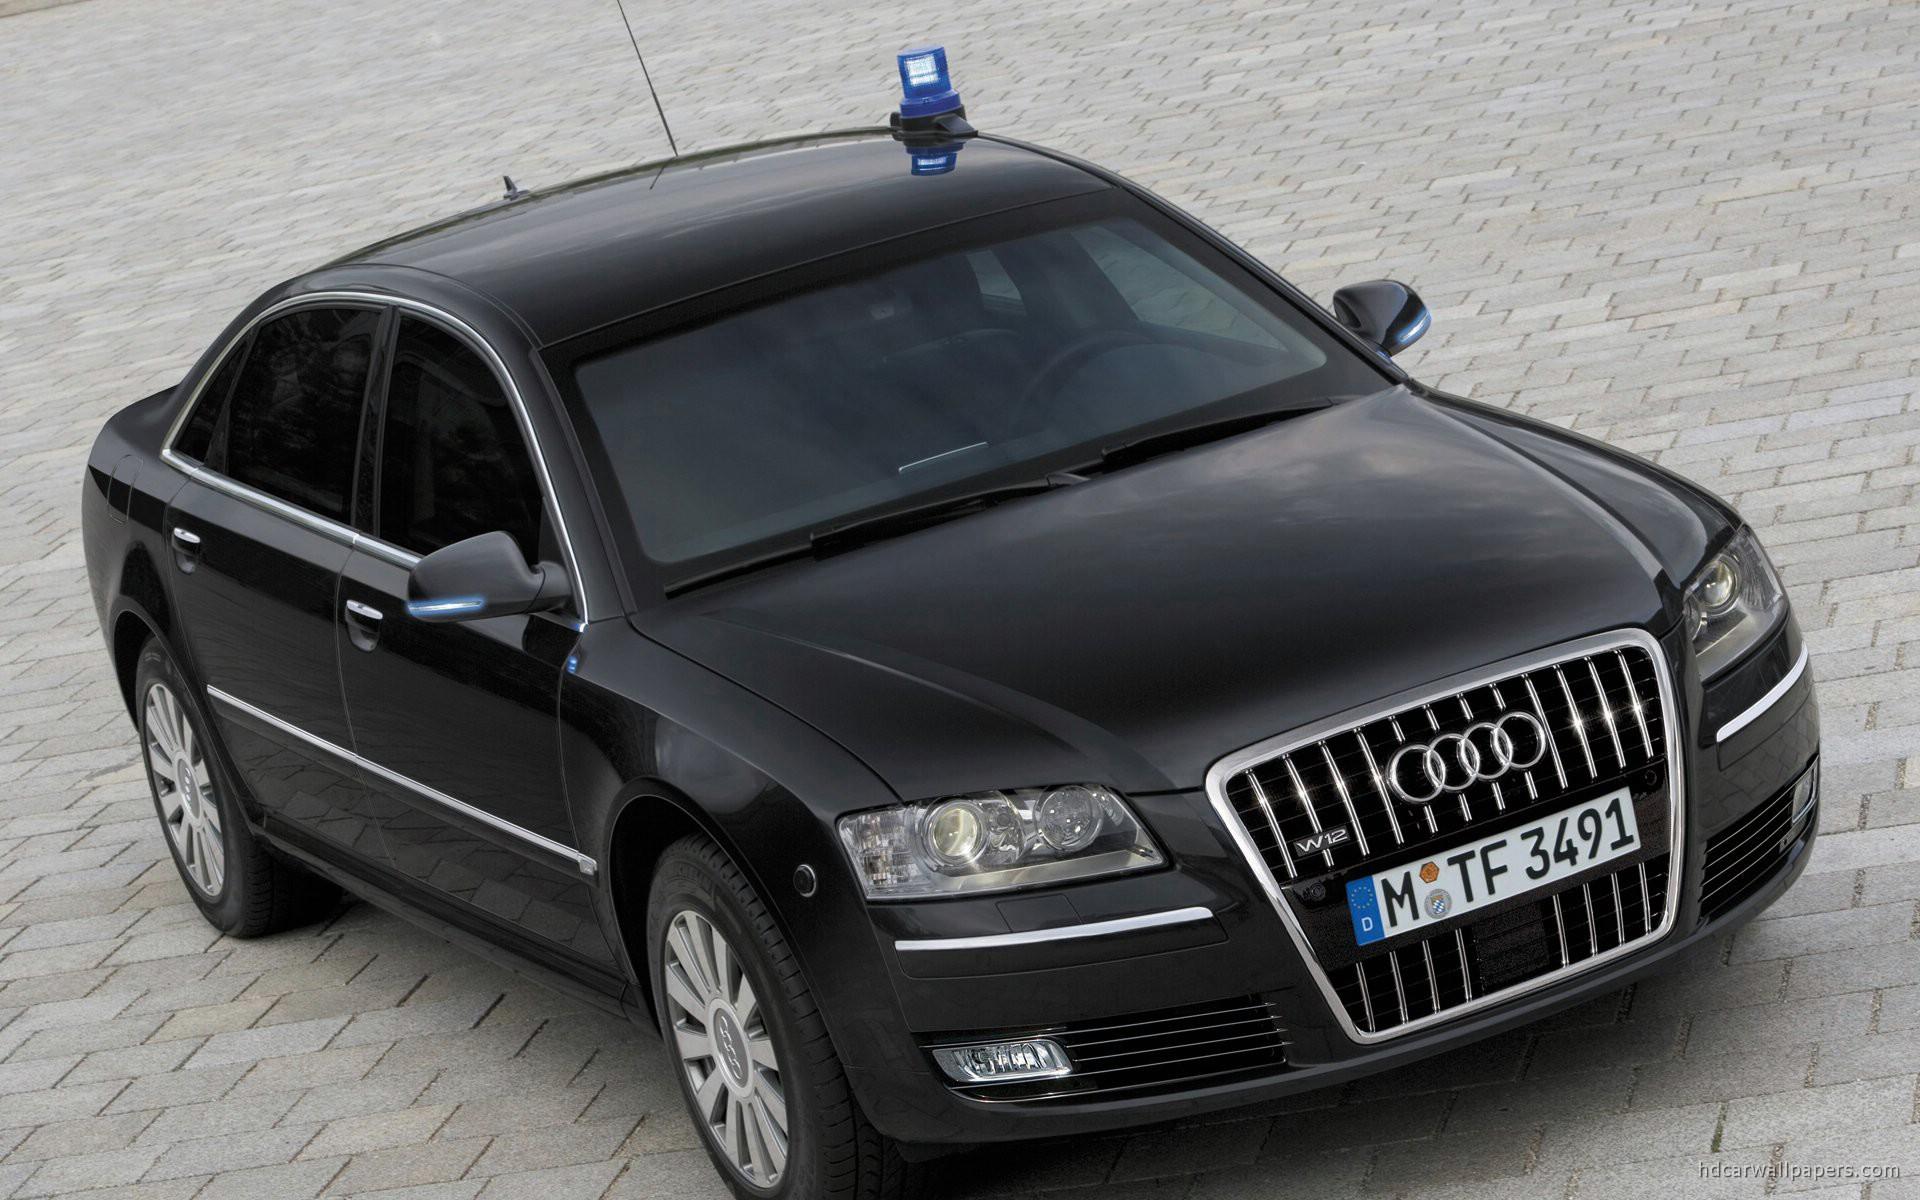 Audi A8 W12 Security Wallpaper | HD Car Wallpapers | ID #142